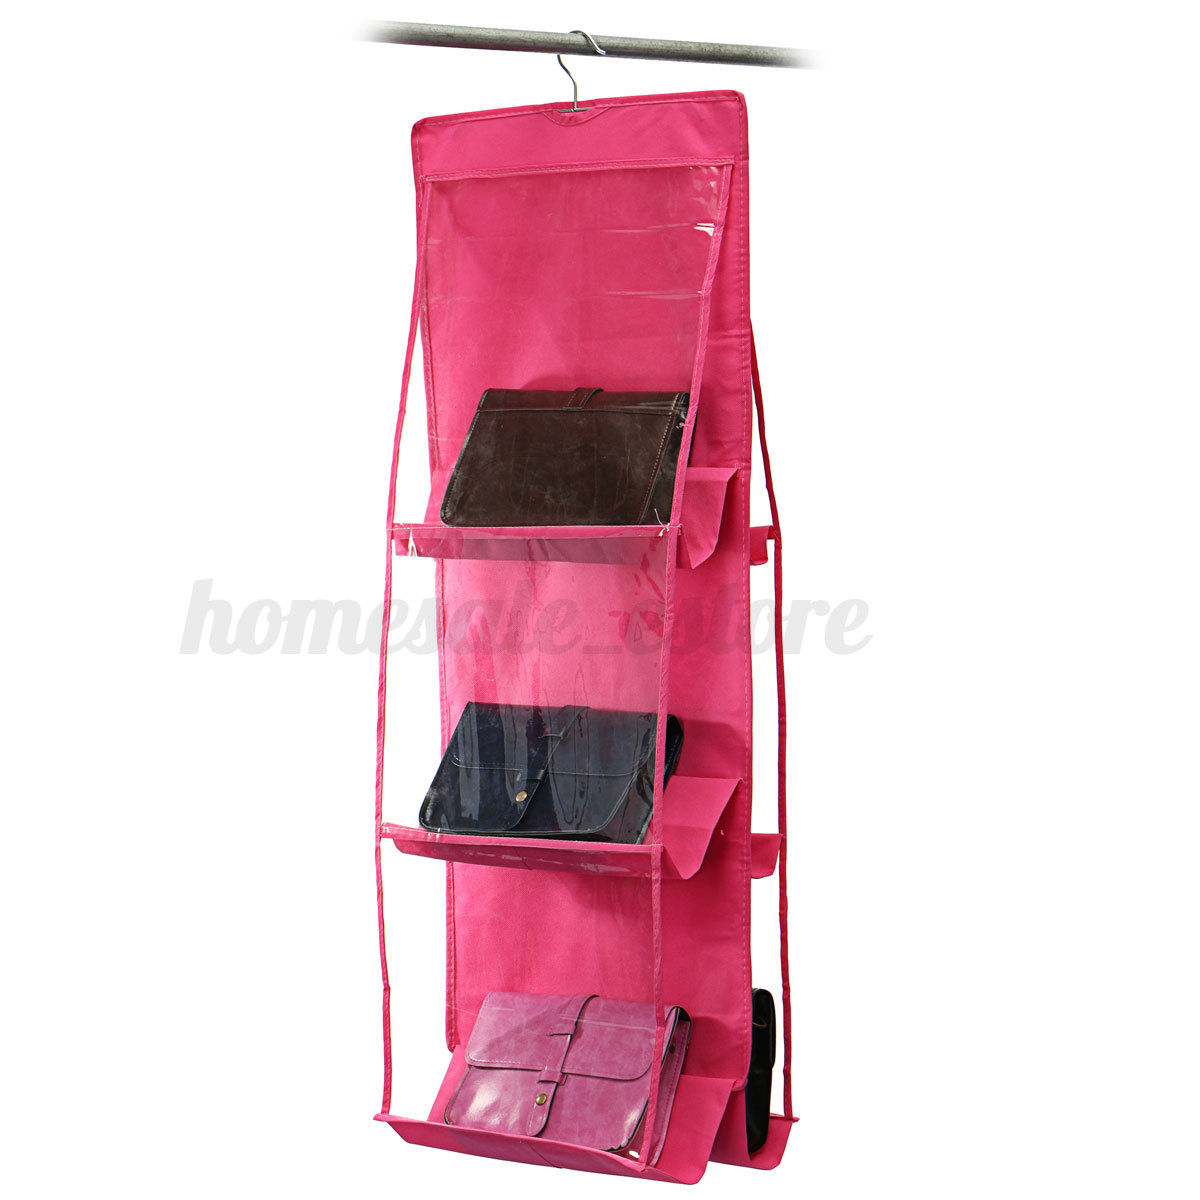 6 pocket shelf bags purse handbags organizer door hanging